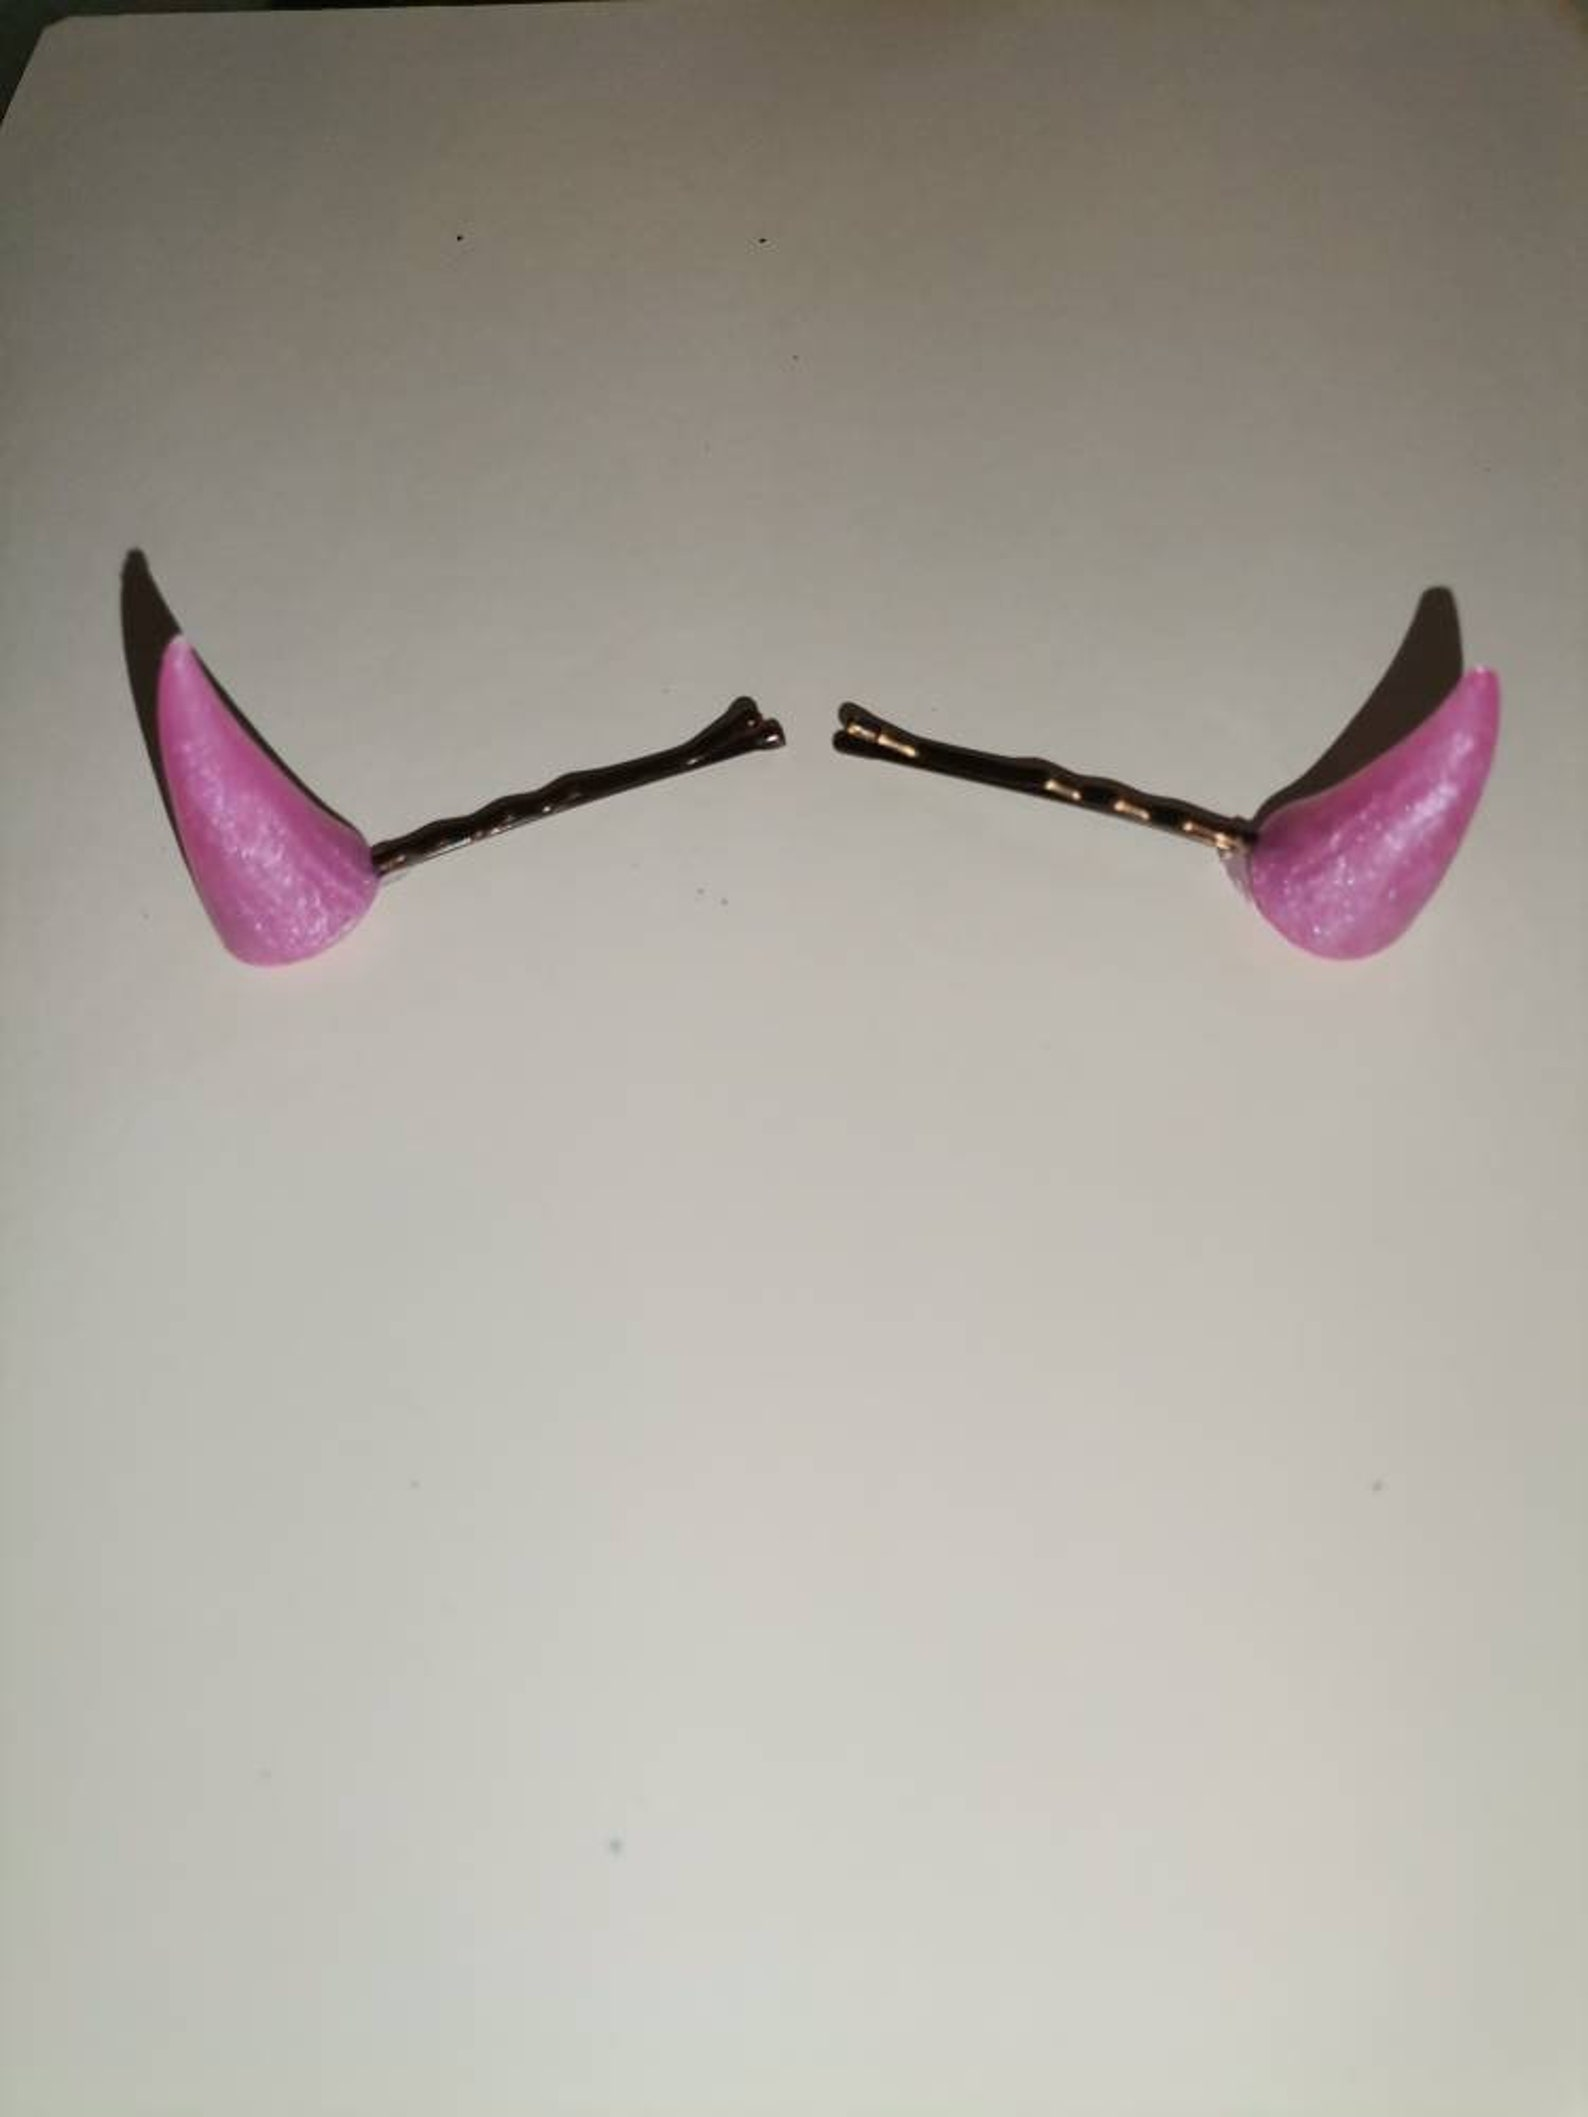 Rosa Dämon Teufel Horn Haarspangen Cosplay Petplay Kuh   Etsy